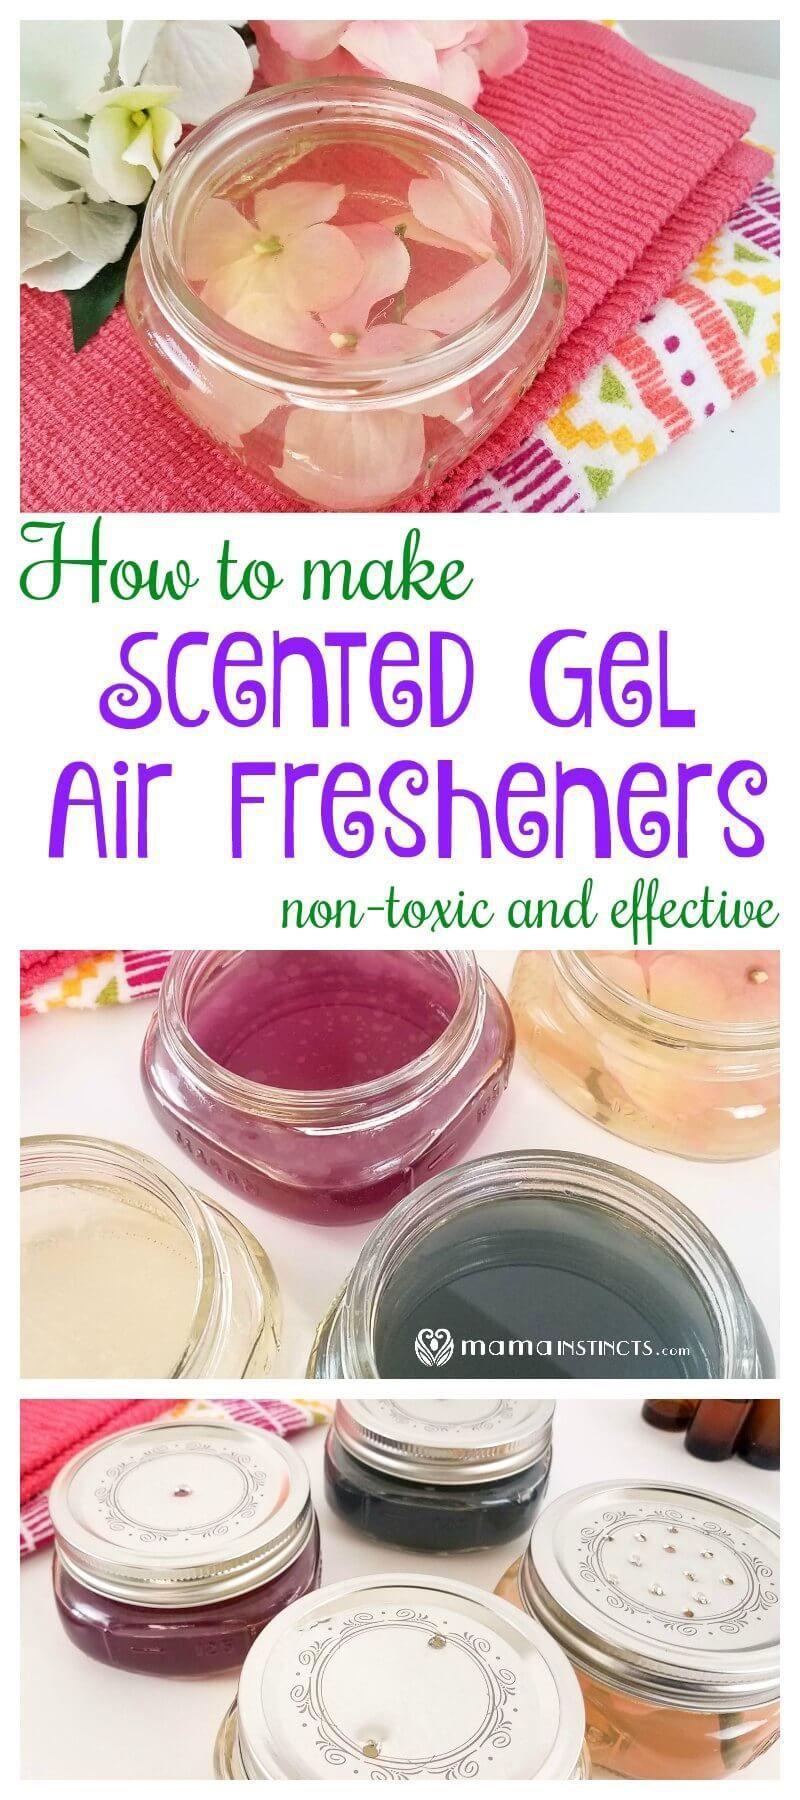 Scented Gel Air Fresheners Recipe Homemade air